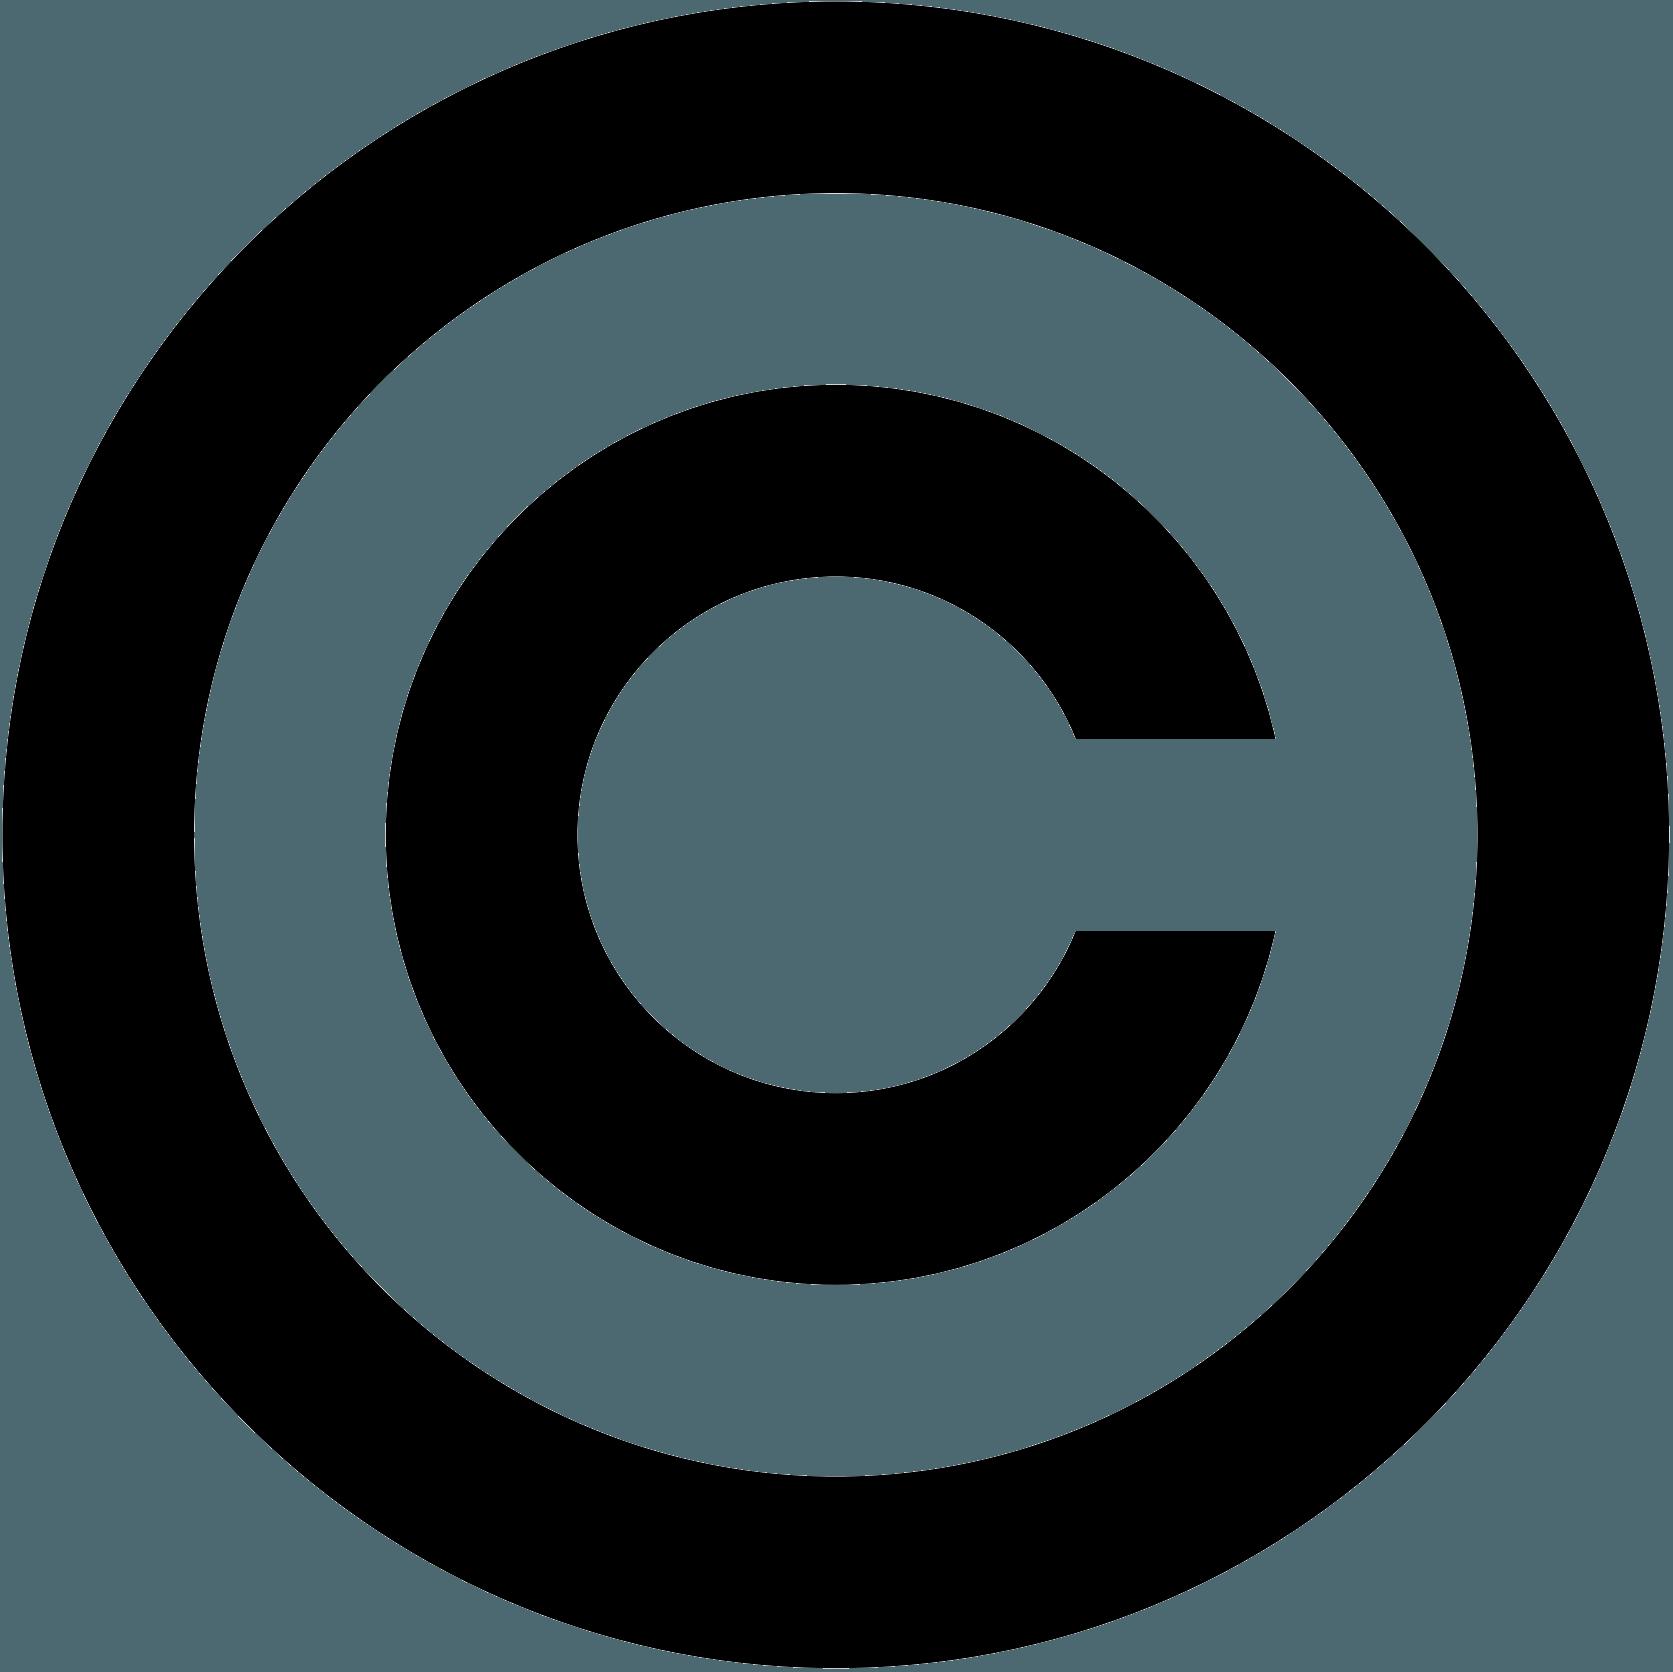 Copyright Logo Symbol png